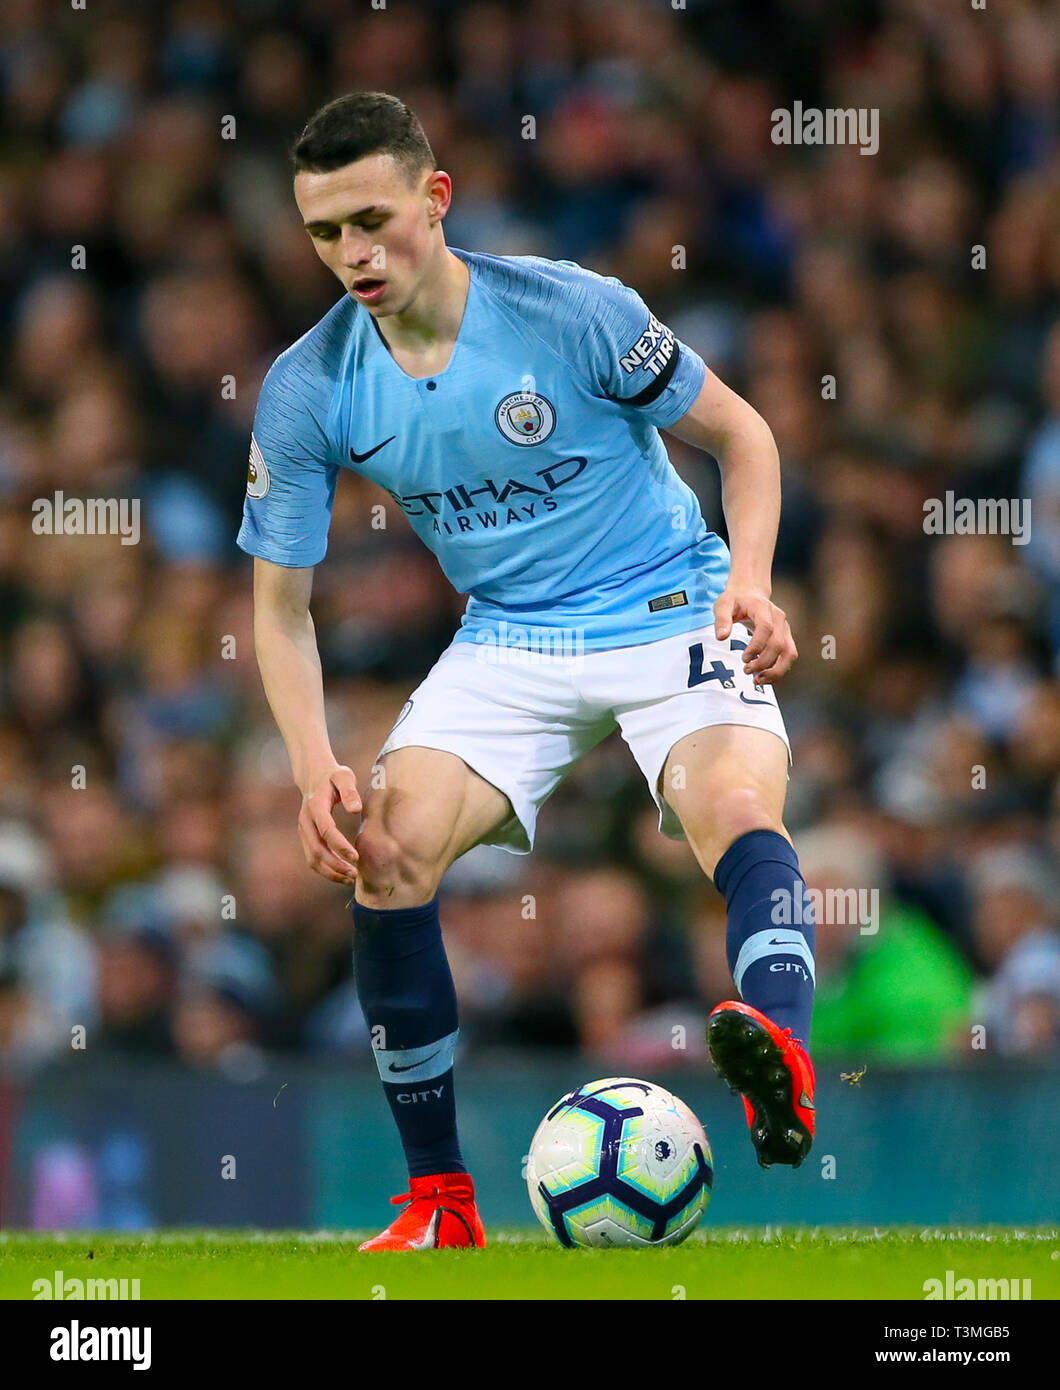 Manchester City's Phil poden Foto de stock